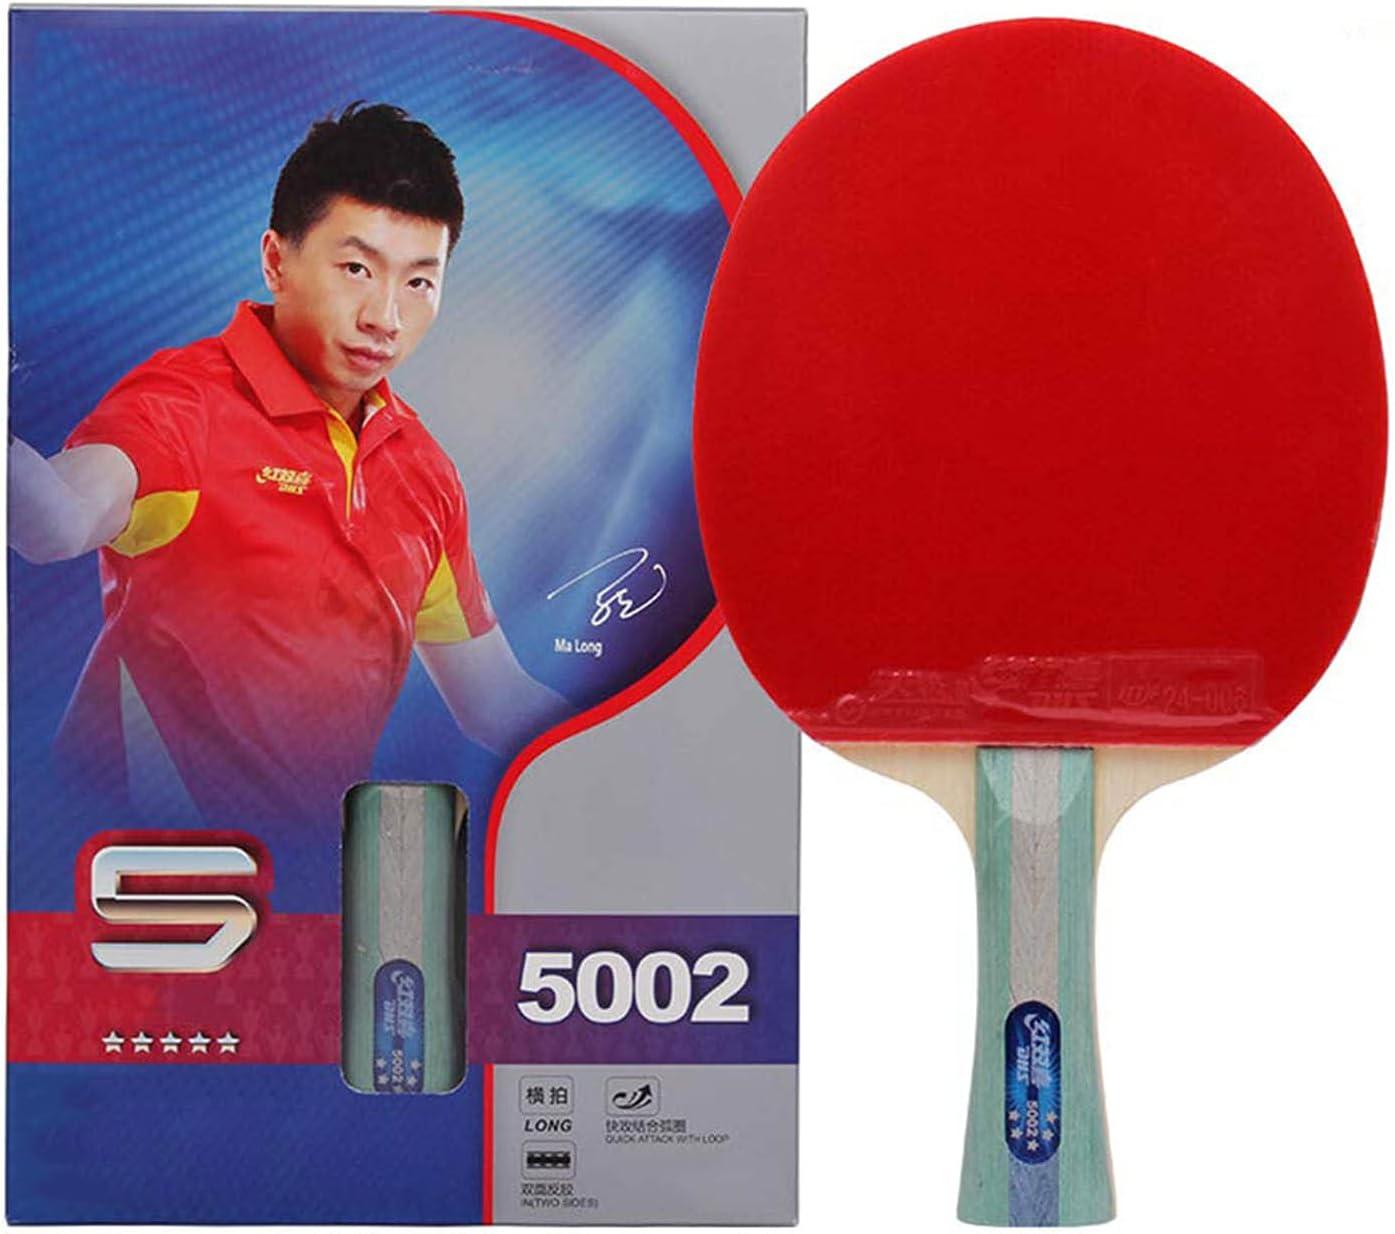 HHXD Juego de Raquetas de Ping Pong, Juego de Entretenimiento para 2 Personas,5 Estrellas Tipo, Esponja Elástica alta, con Bolsa/Double rackets/A